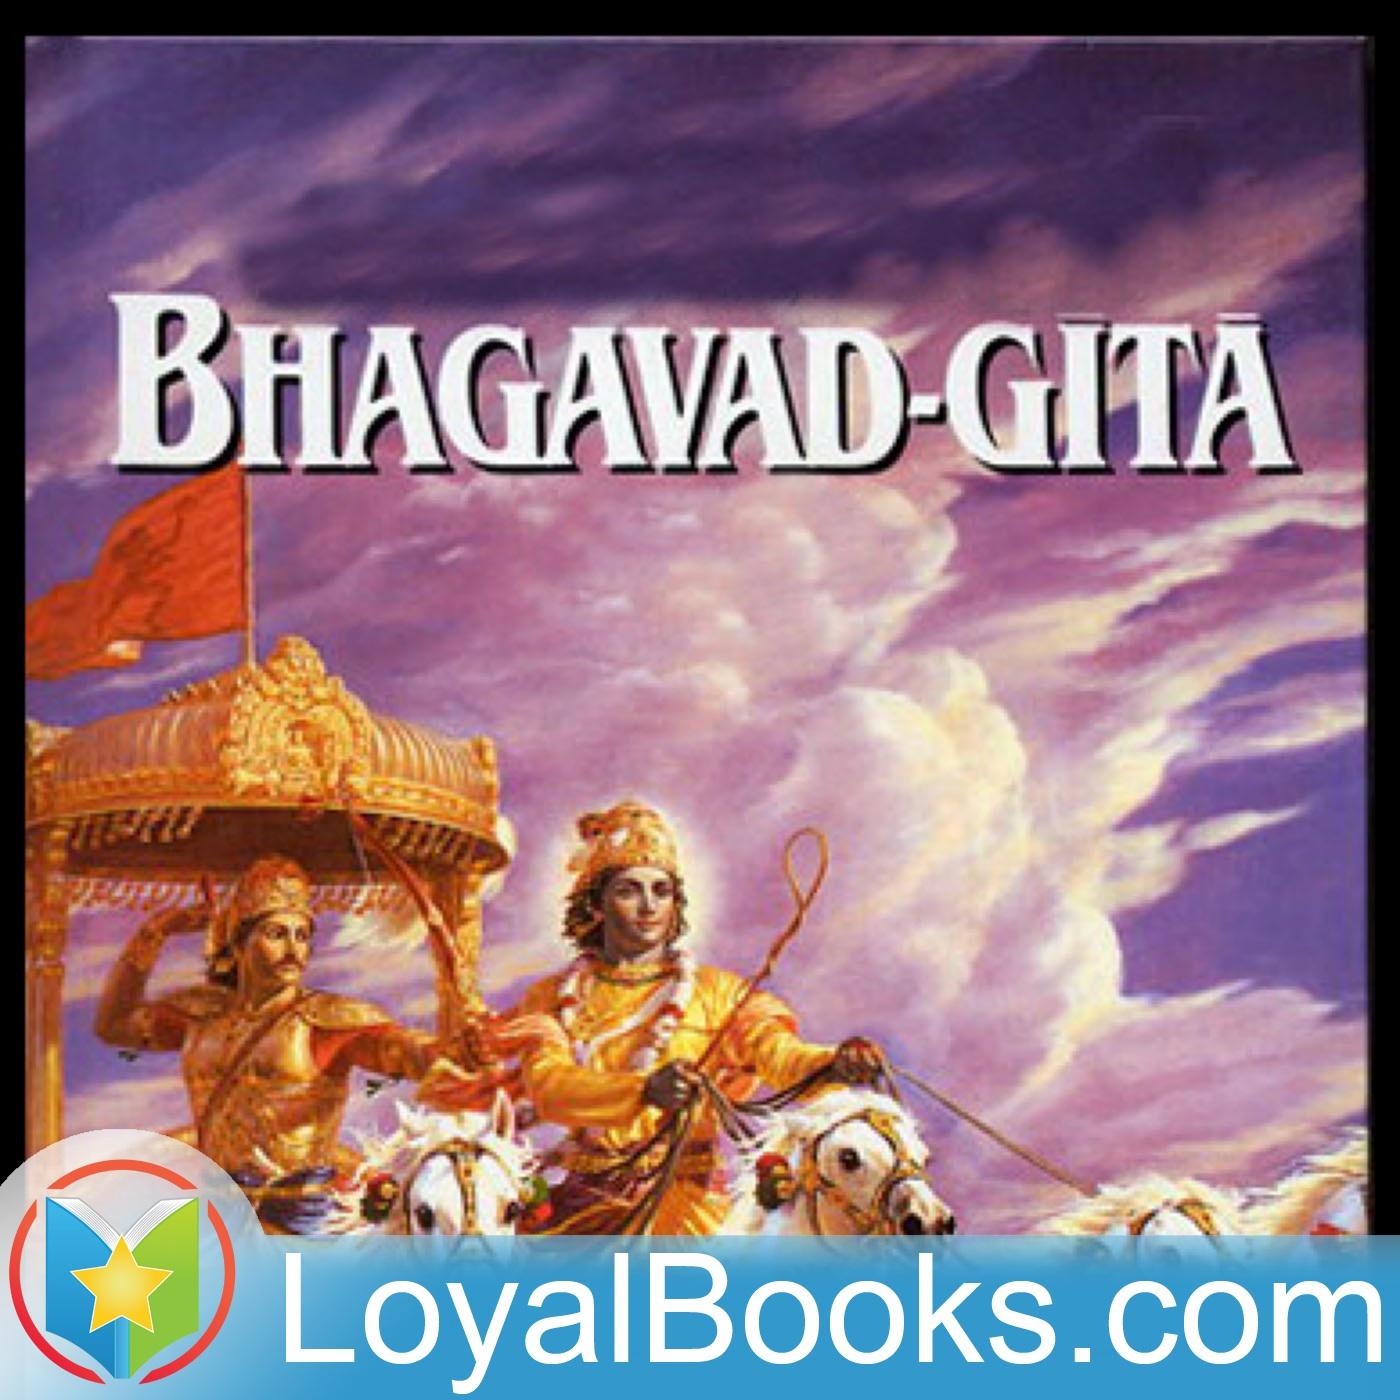 <![CDATA[Bhagavad Gita by Sir Edwin Arnold (Translator)]]>